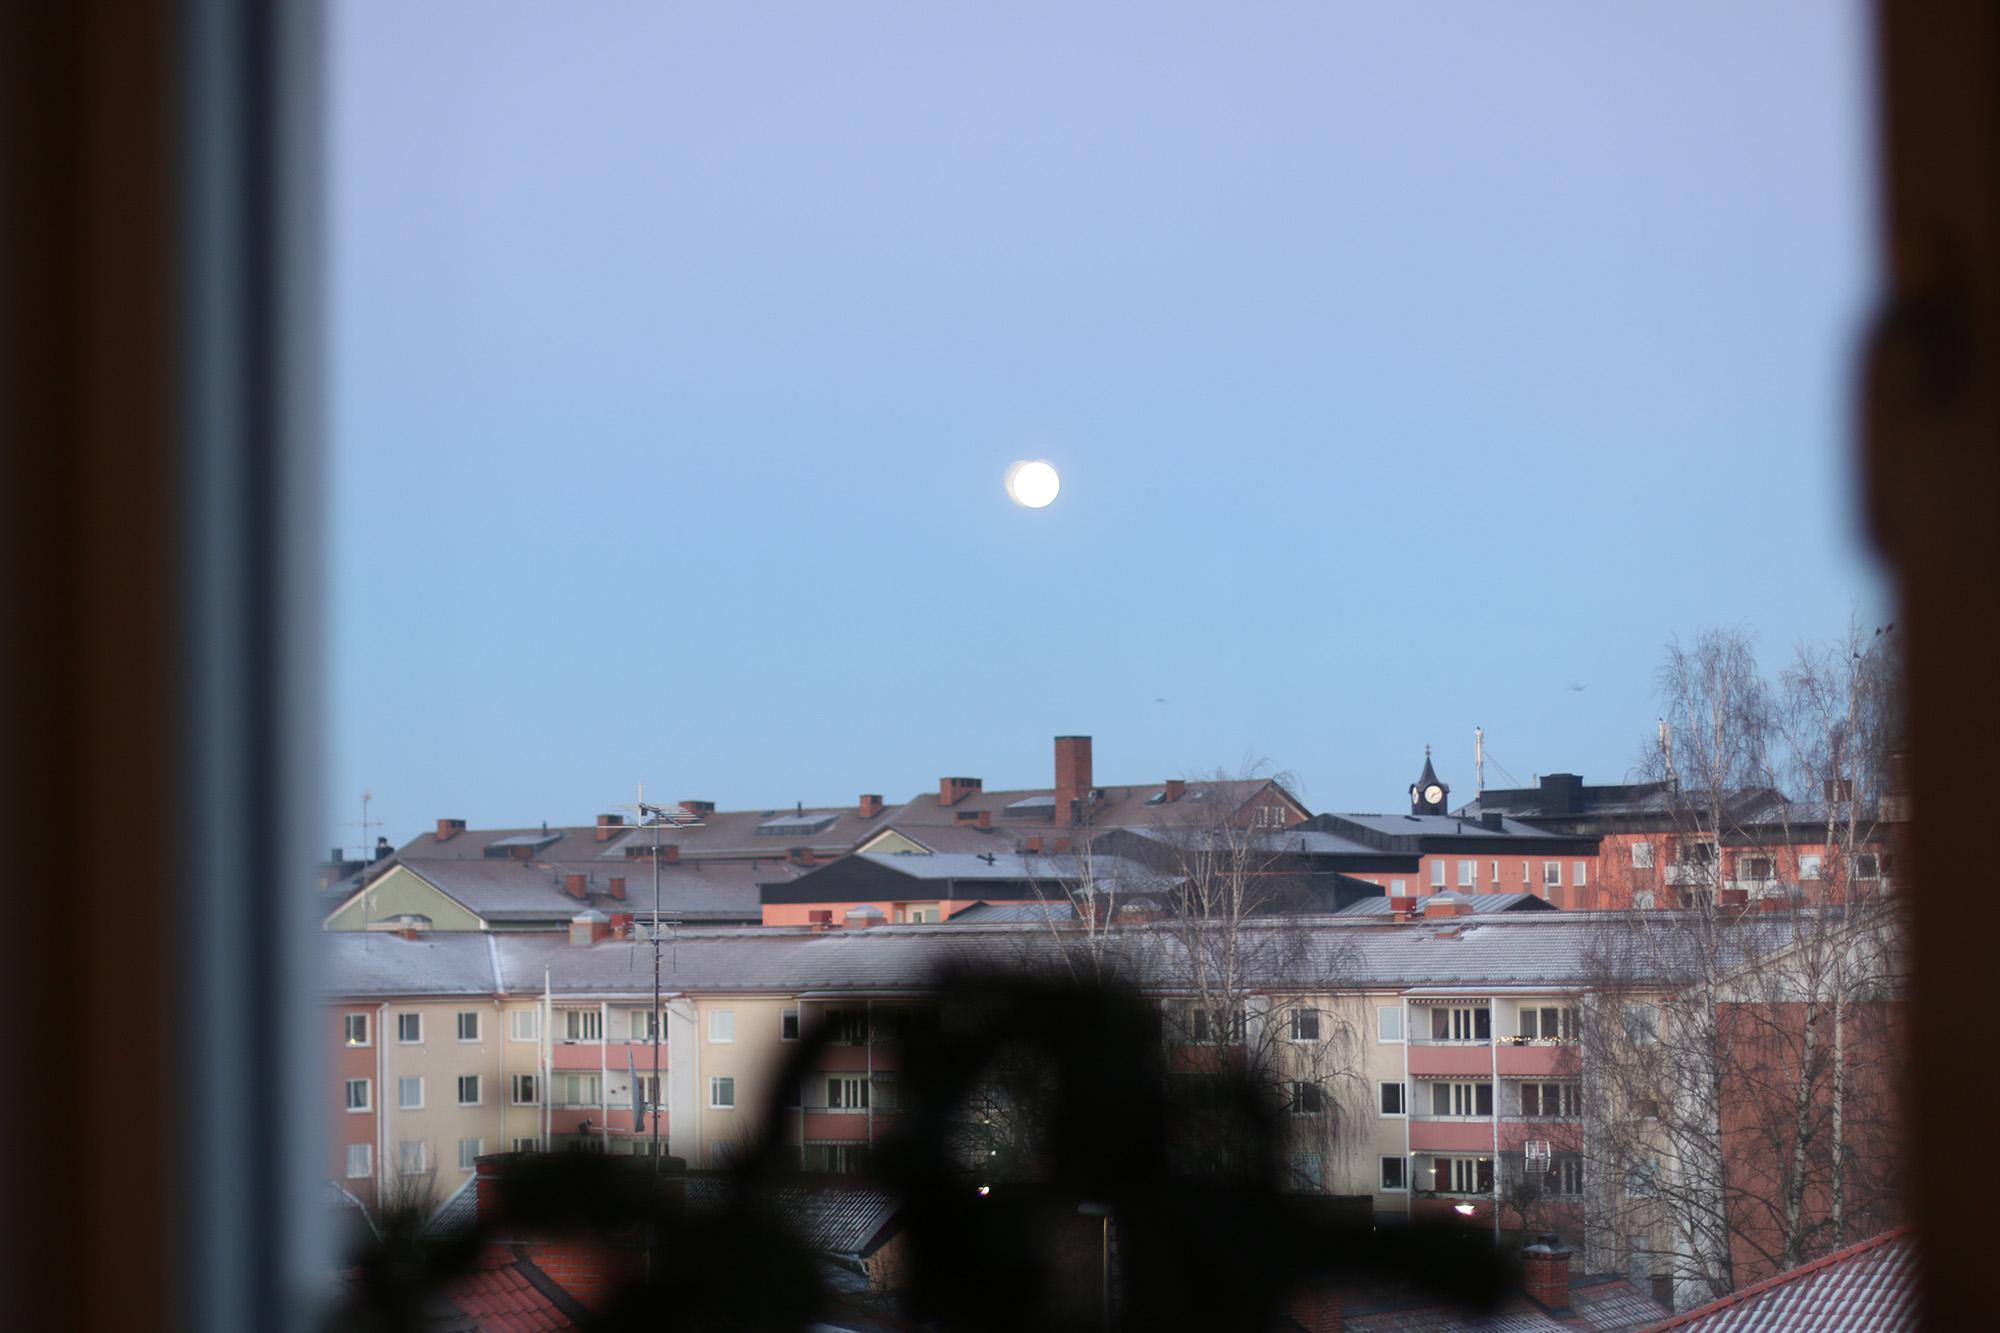 IMG_8504 fullmåne